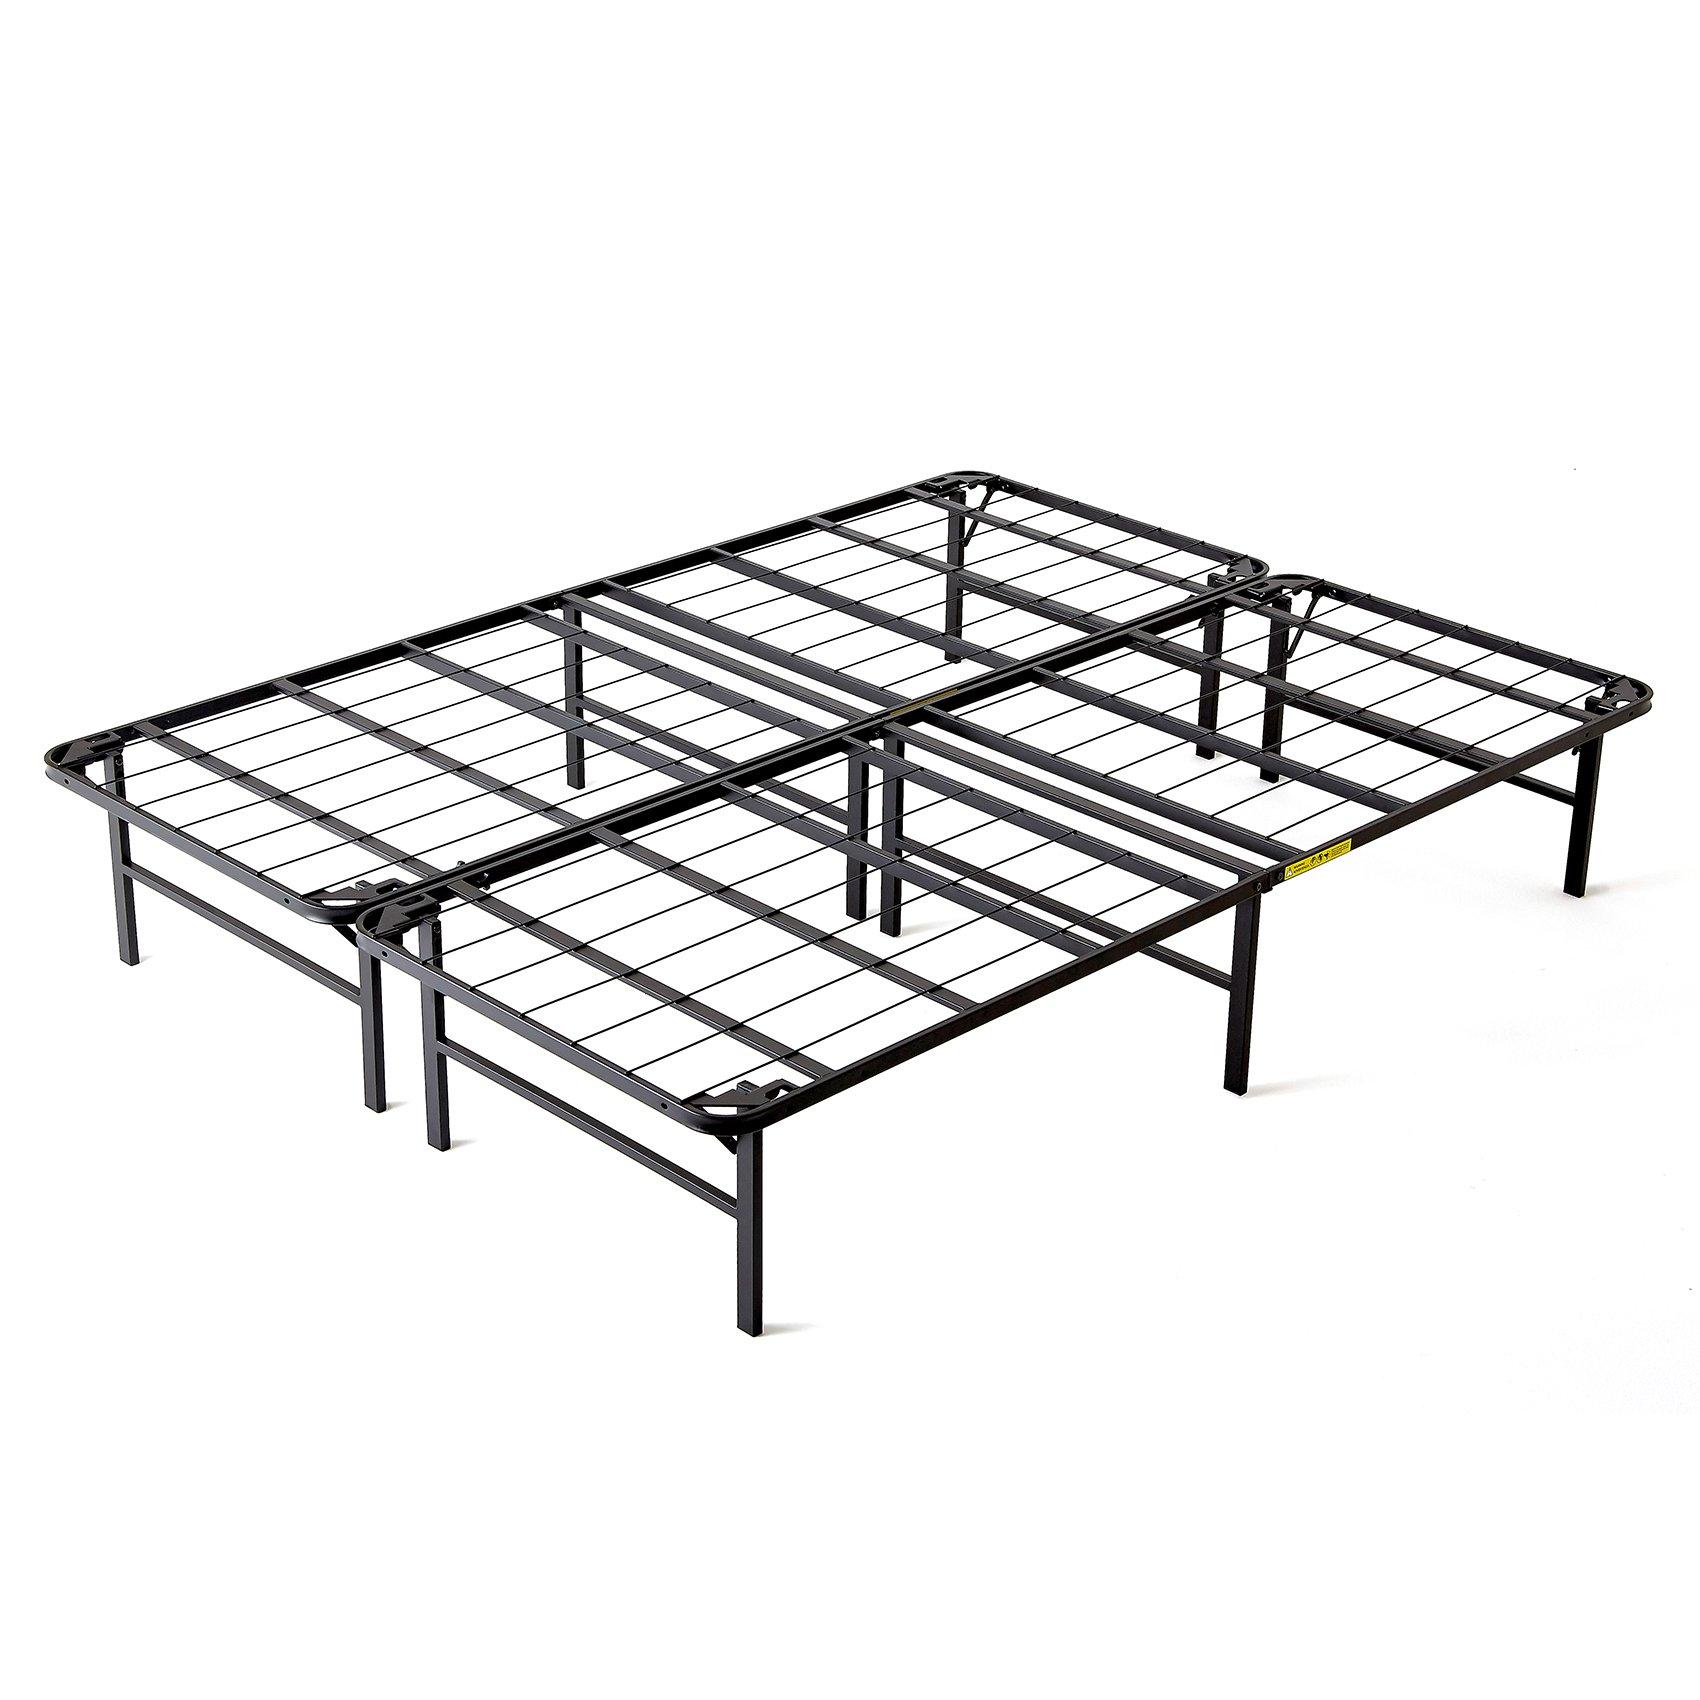 intelliBASE Lightweight Easy Set Up Bi-Fold Platform Metal Bed Frame, Full by intelliBASE